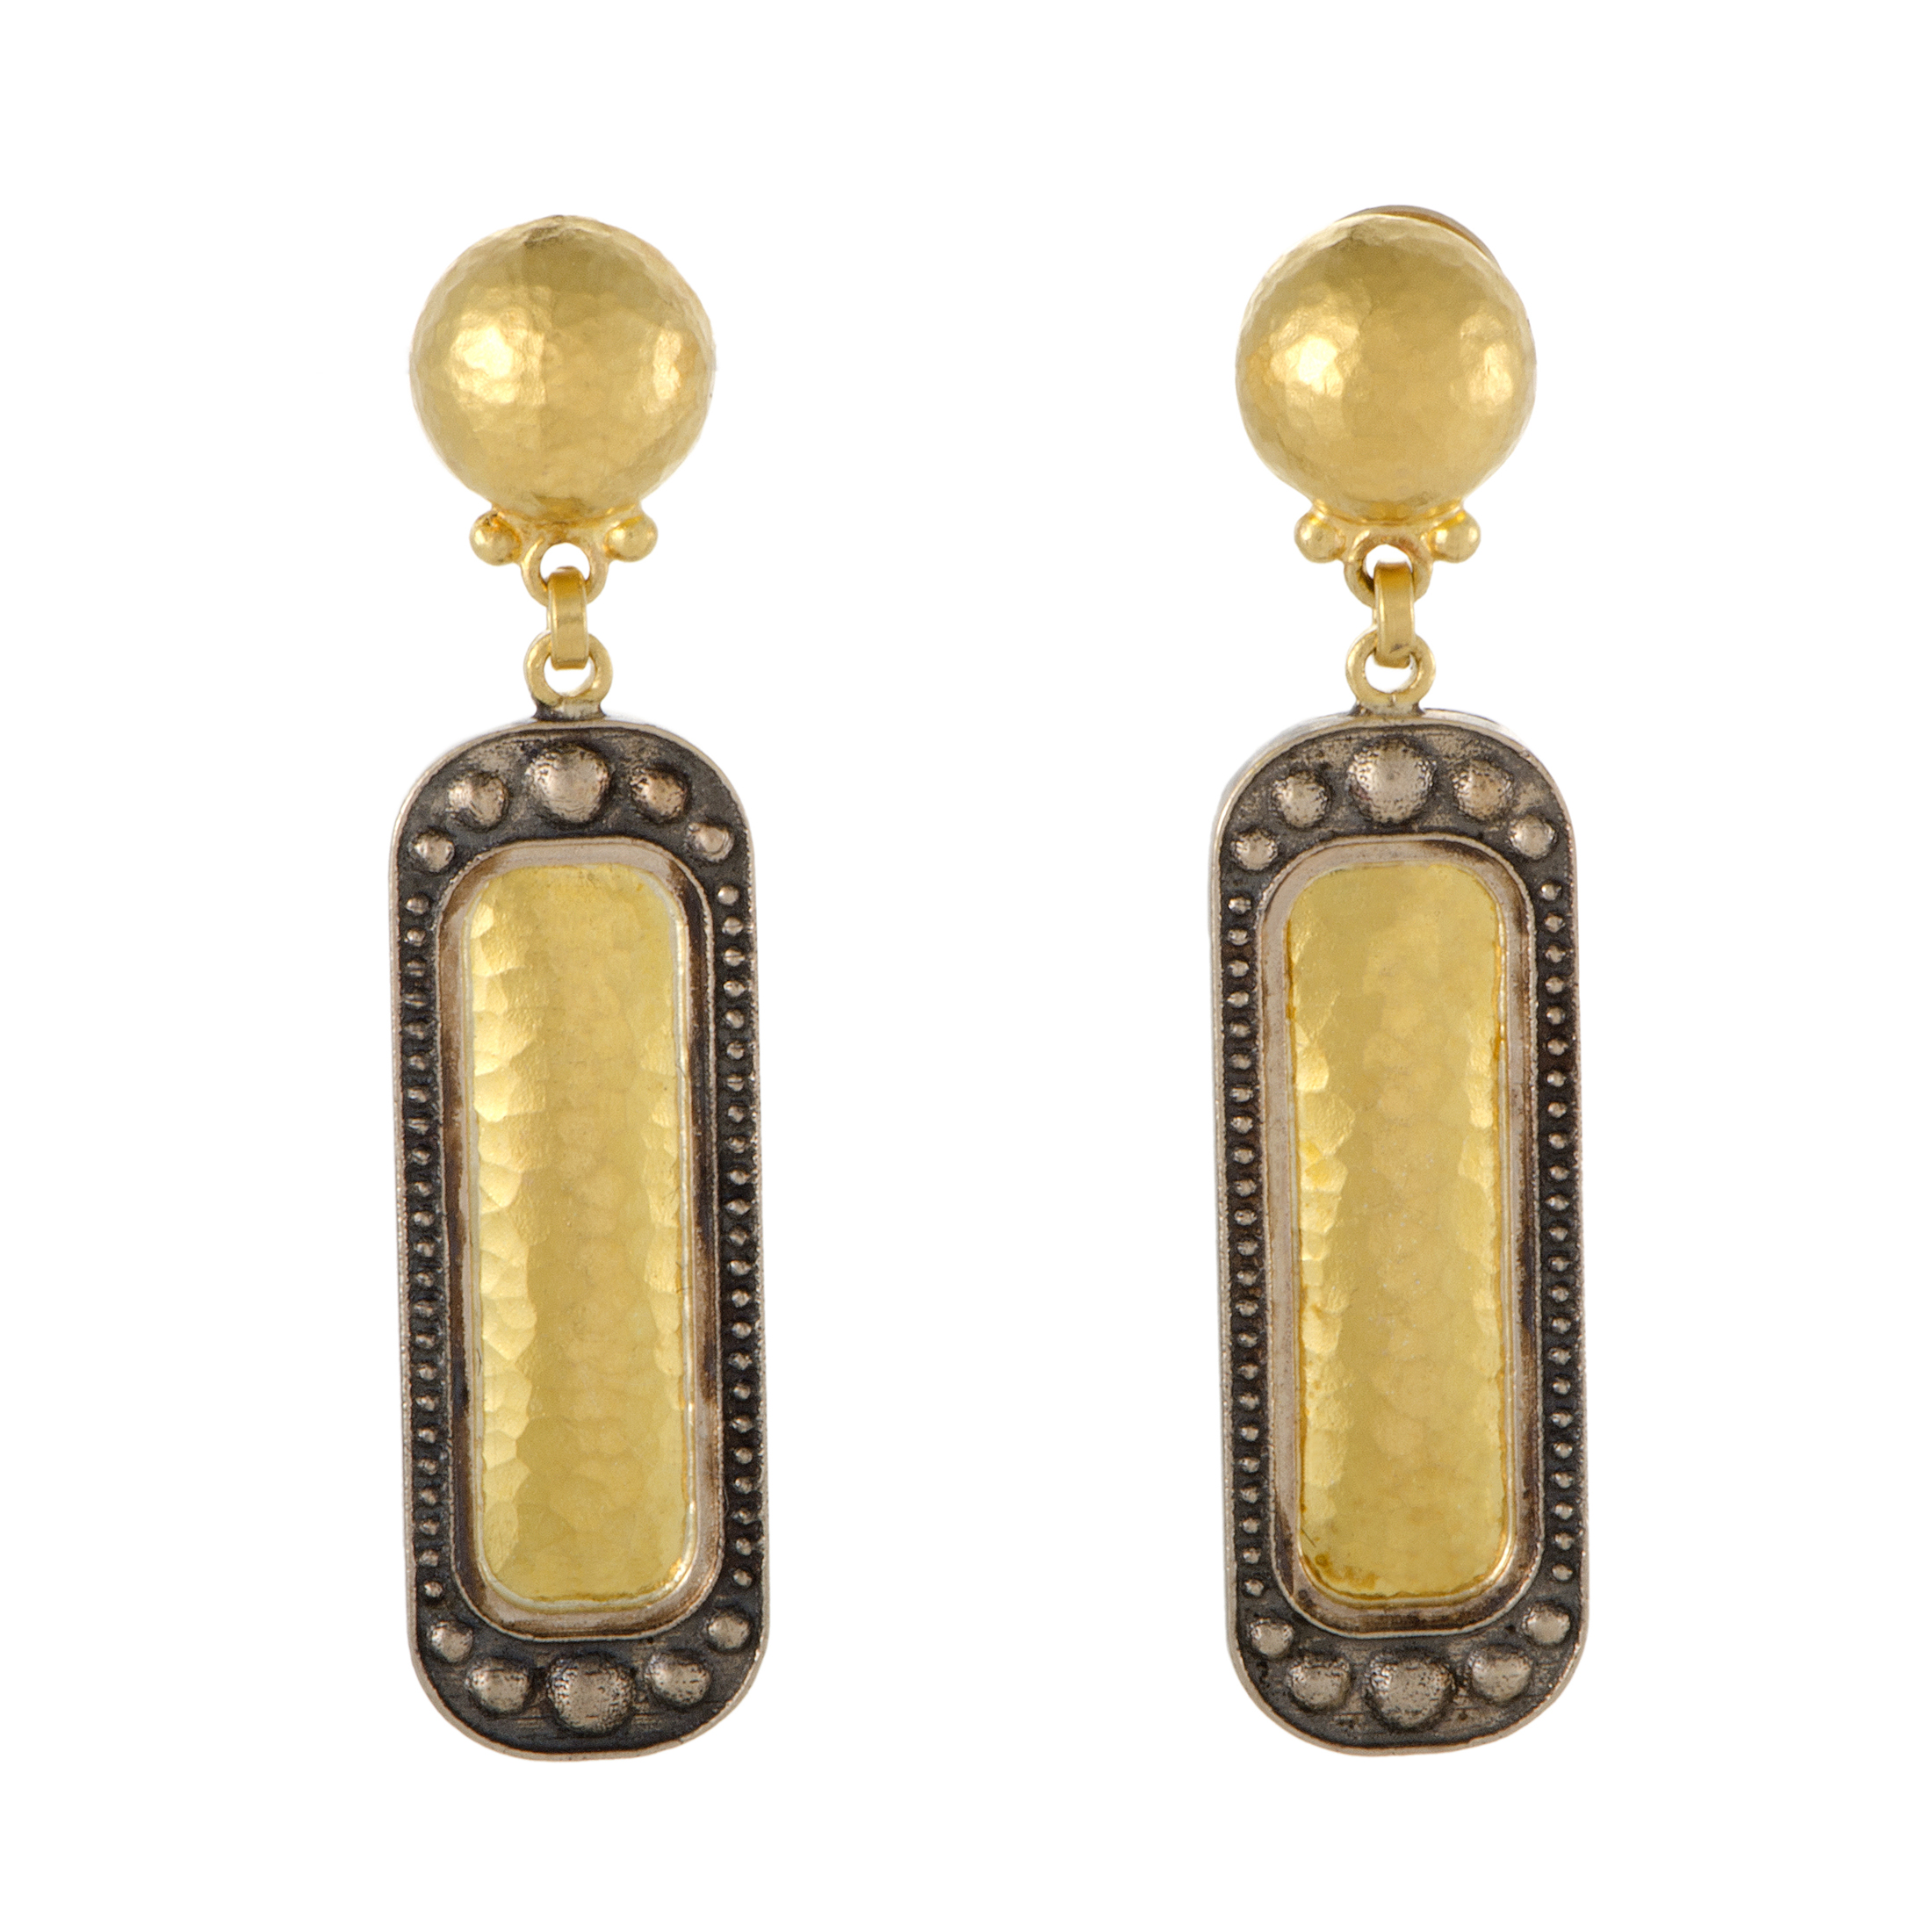 Womens 24K Yellow and 18K White Gold Rectangular Drop Earrings